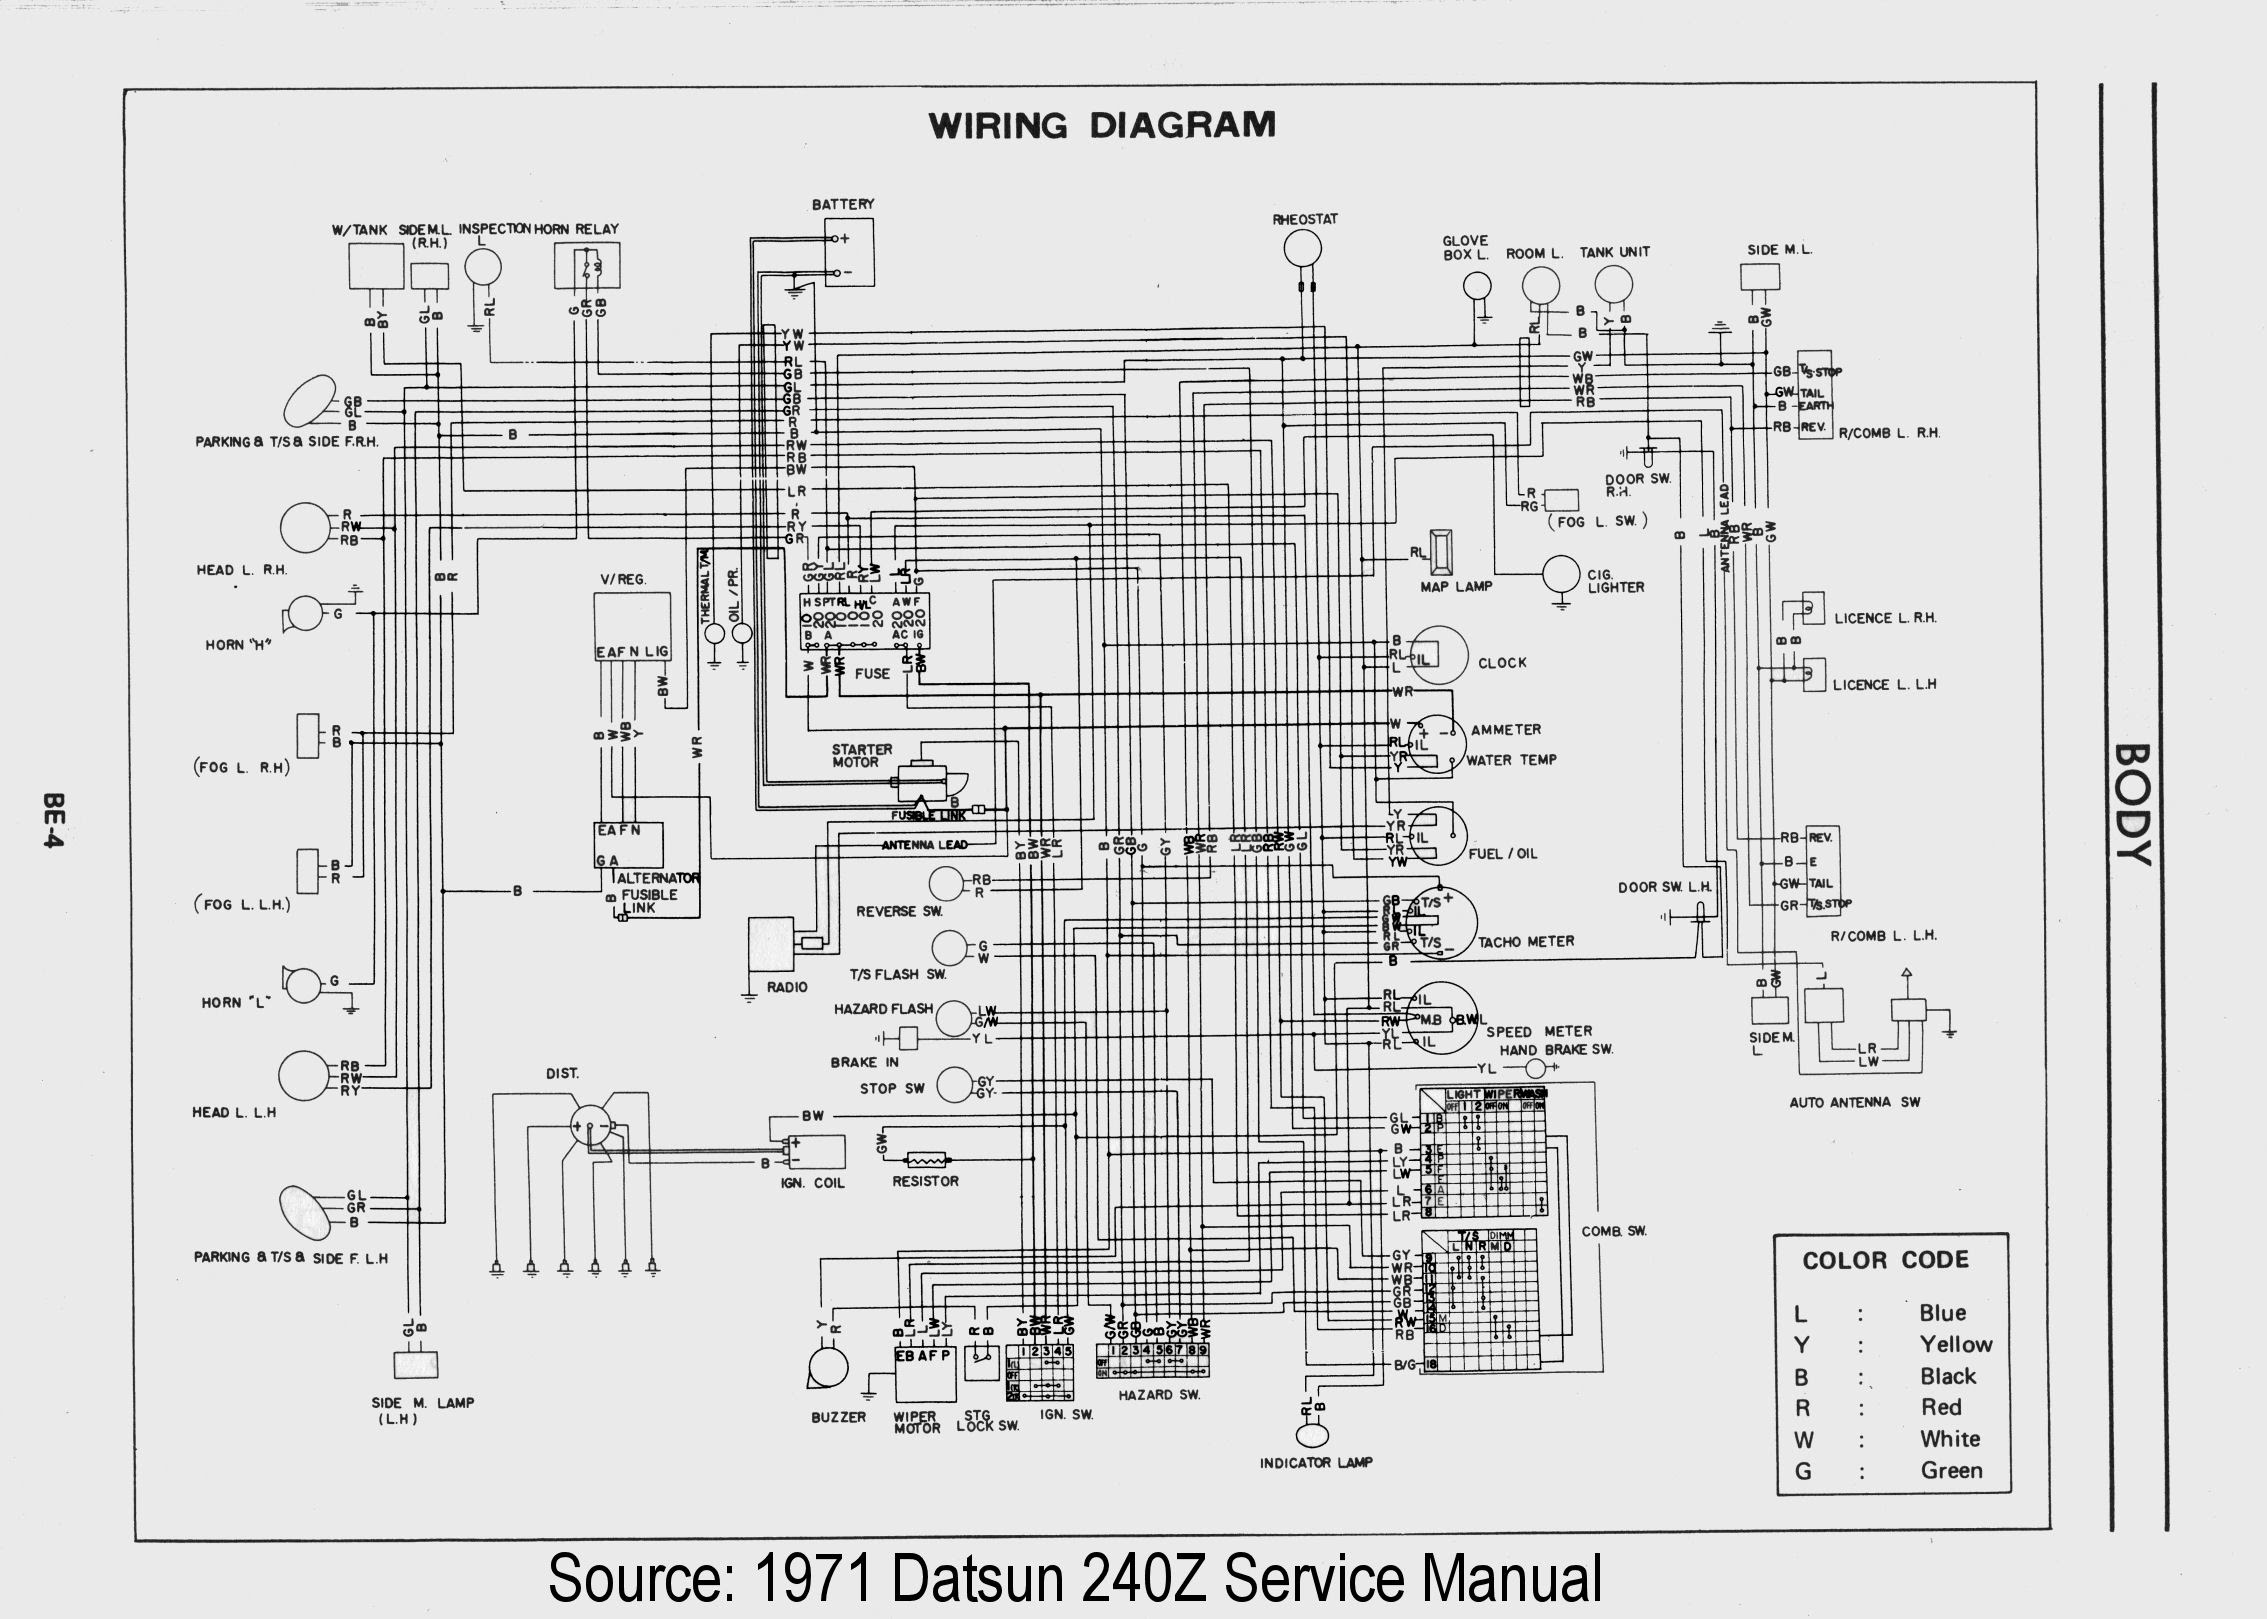 Supply Diagram Power Wiring Hp Ap15pc52